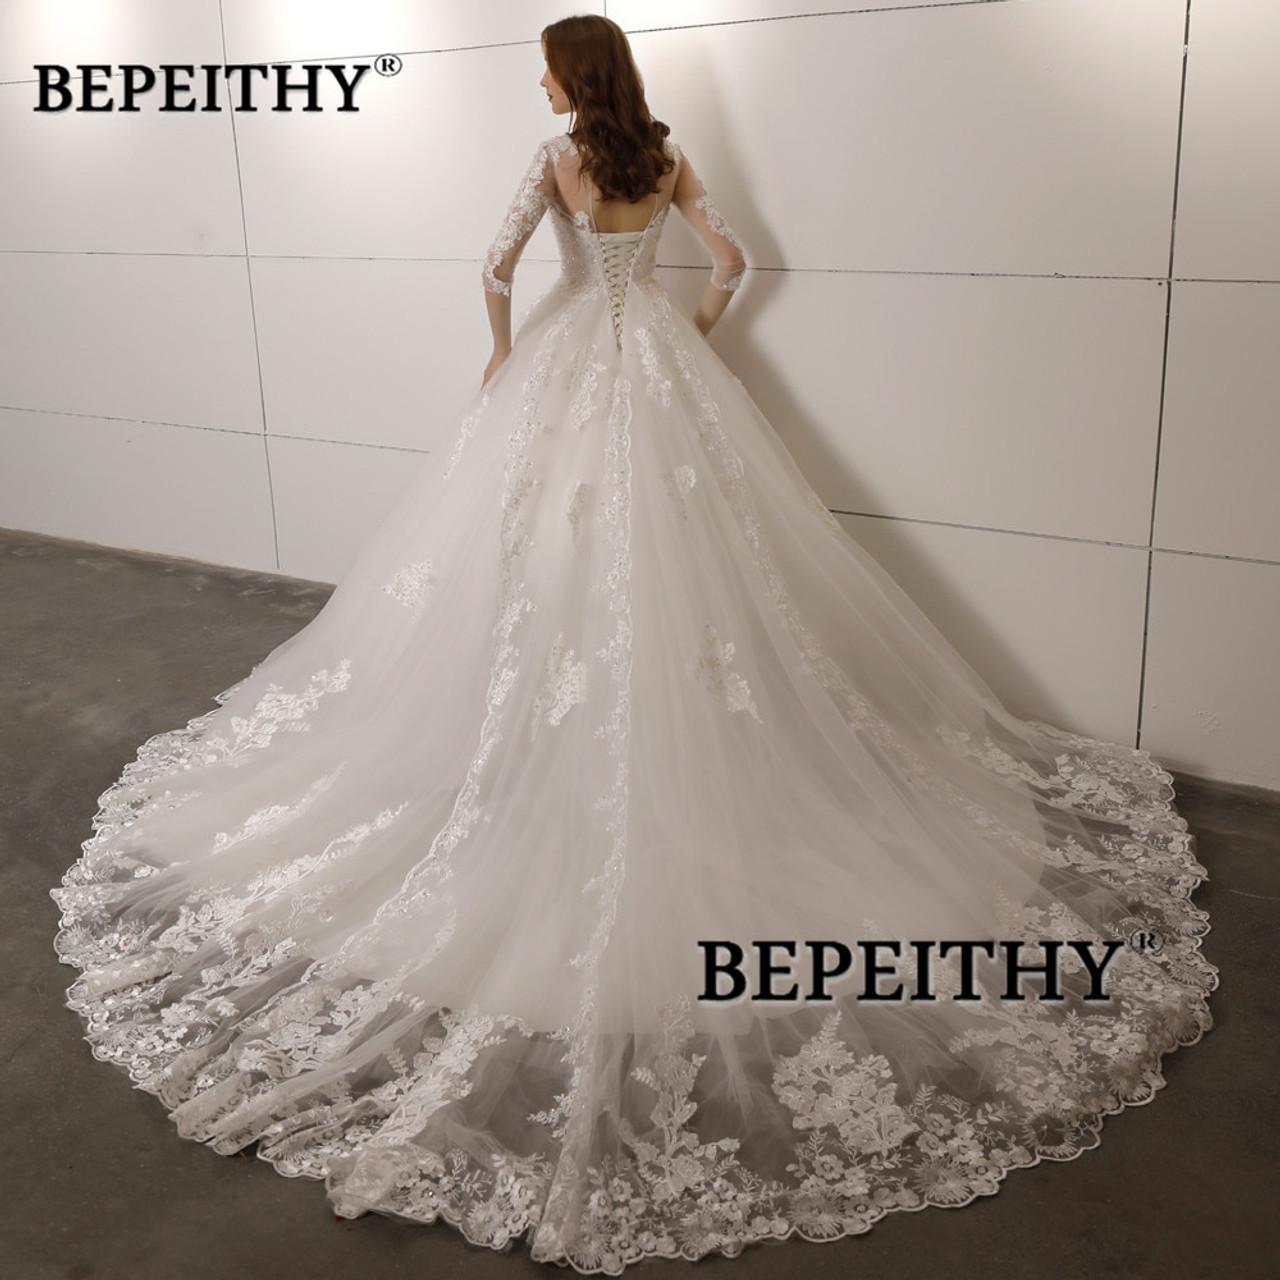 Vestido De Novia Three Quarter Sleeves Lace Wedding Dress 2018 Open Back Vintage Bridal Dresses Ball Gown Hot Sale Onshopdeals Com